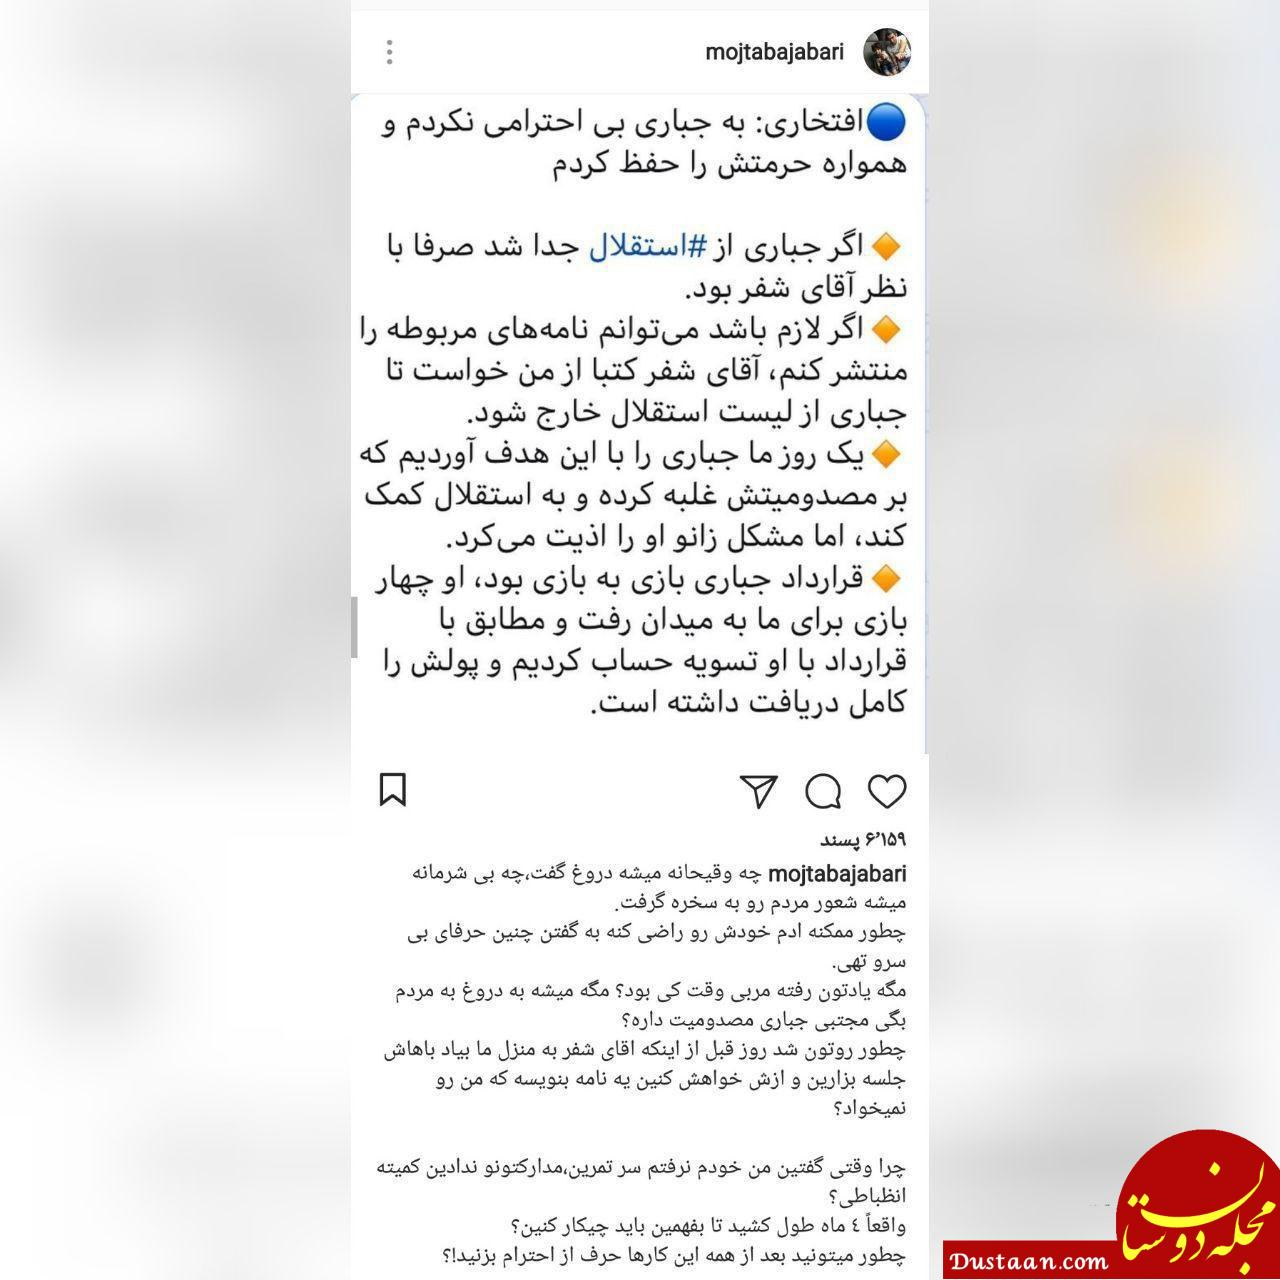 www.dustaan.com واکنش مجتبی جباری به سخنان مدیر استقلال /چه راحت می شه دروغ گفت!